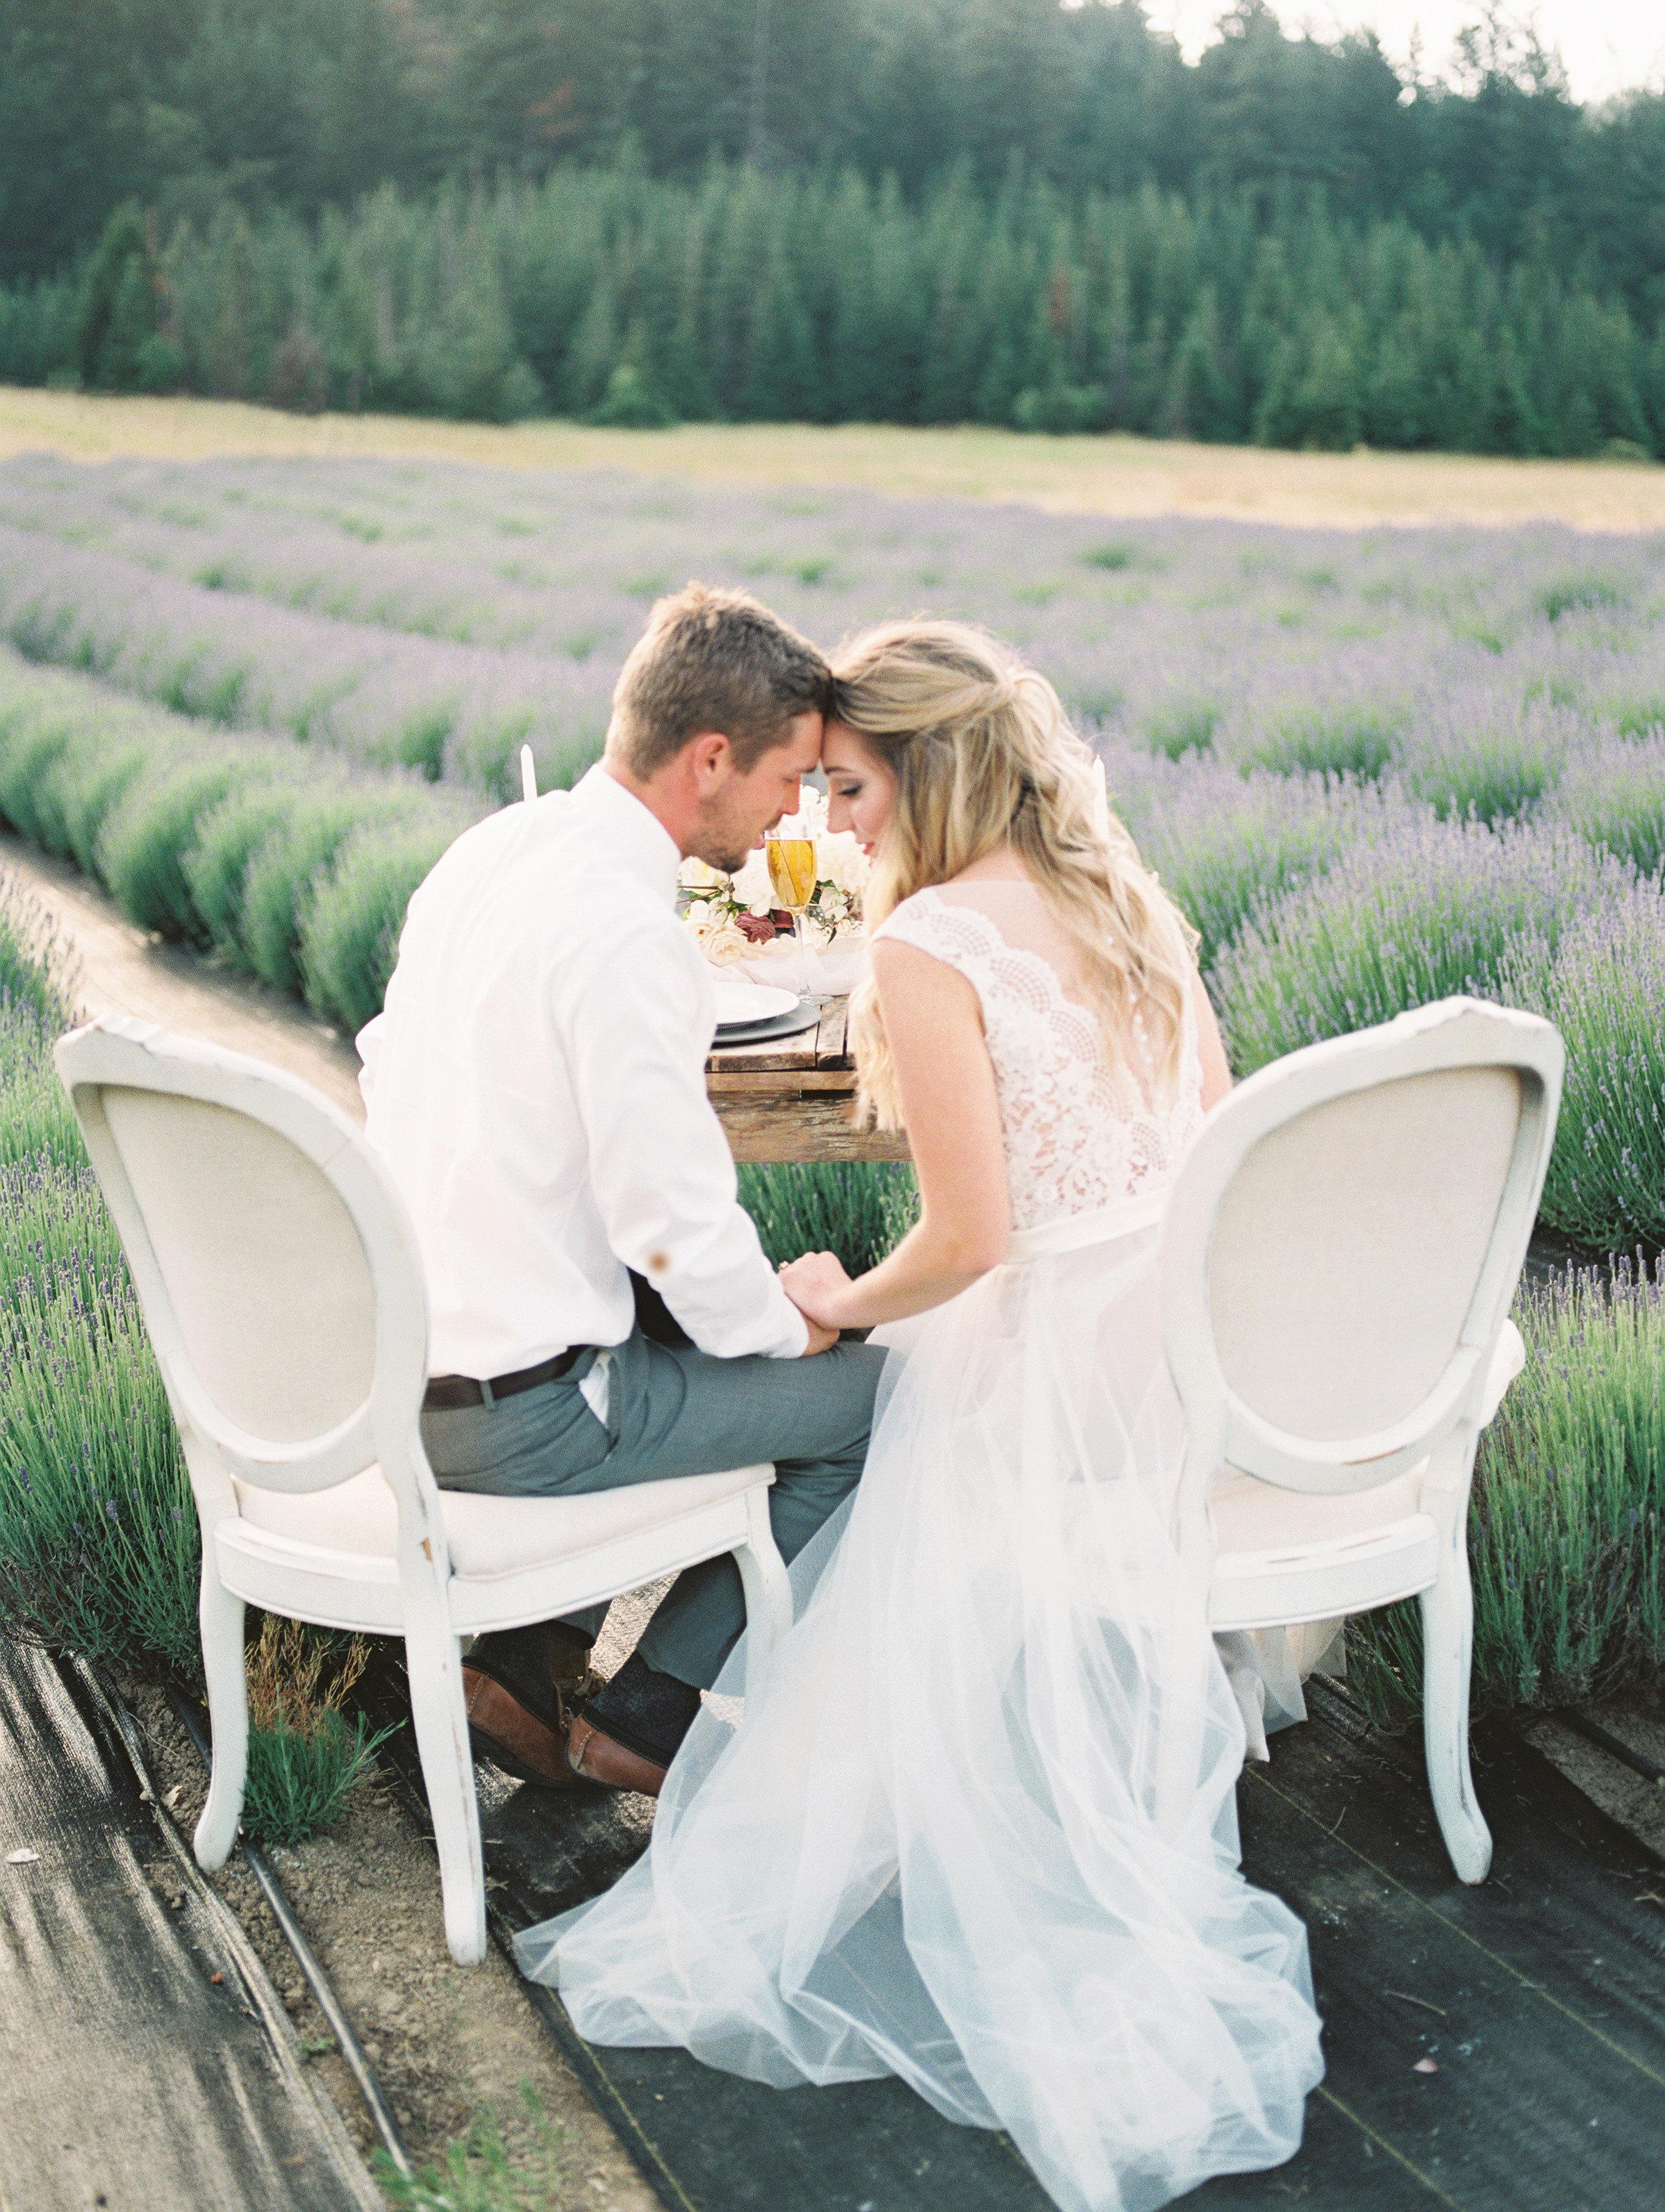 lavender-romance-emilykirstenphotography-69.jpg